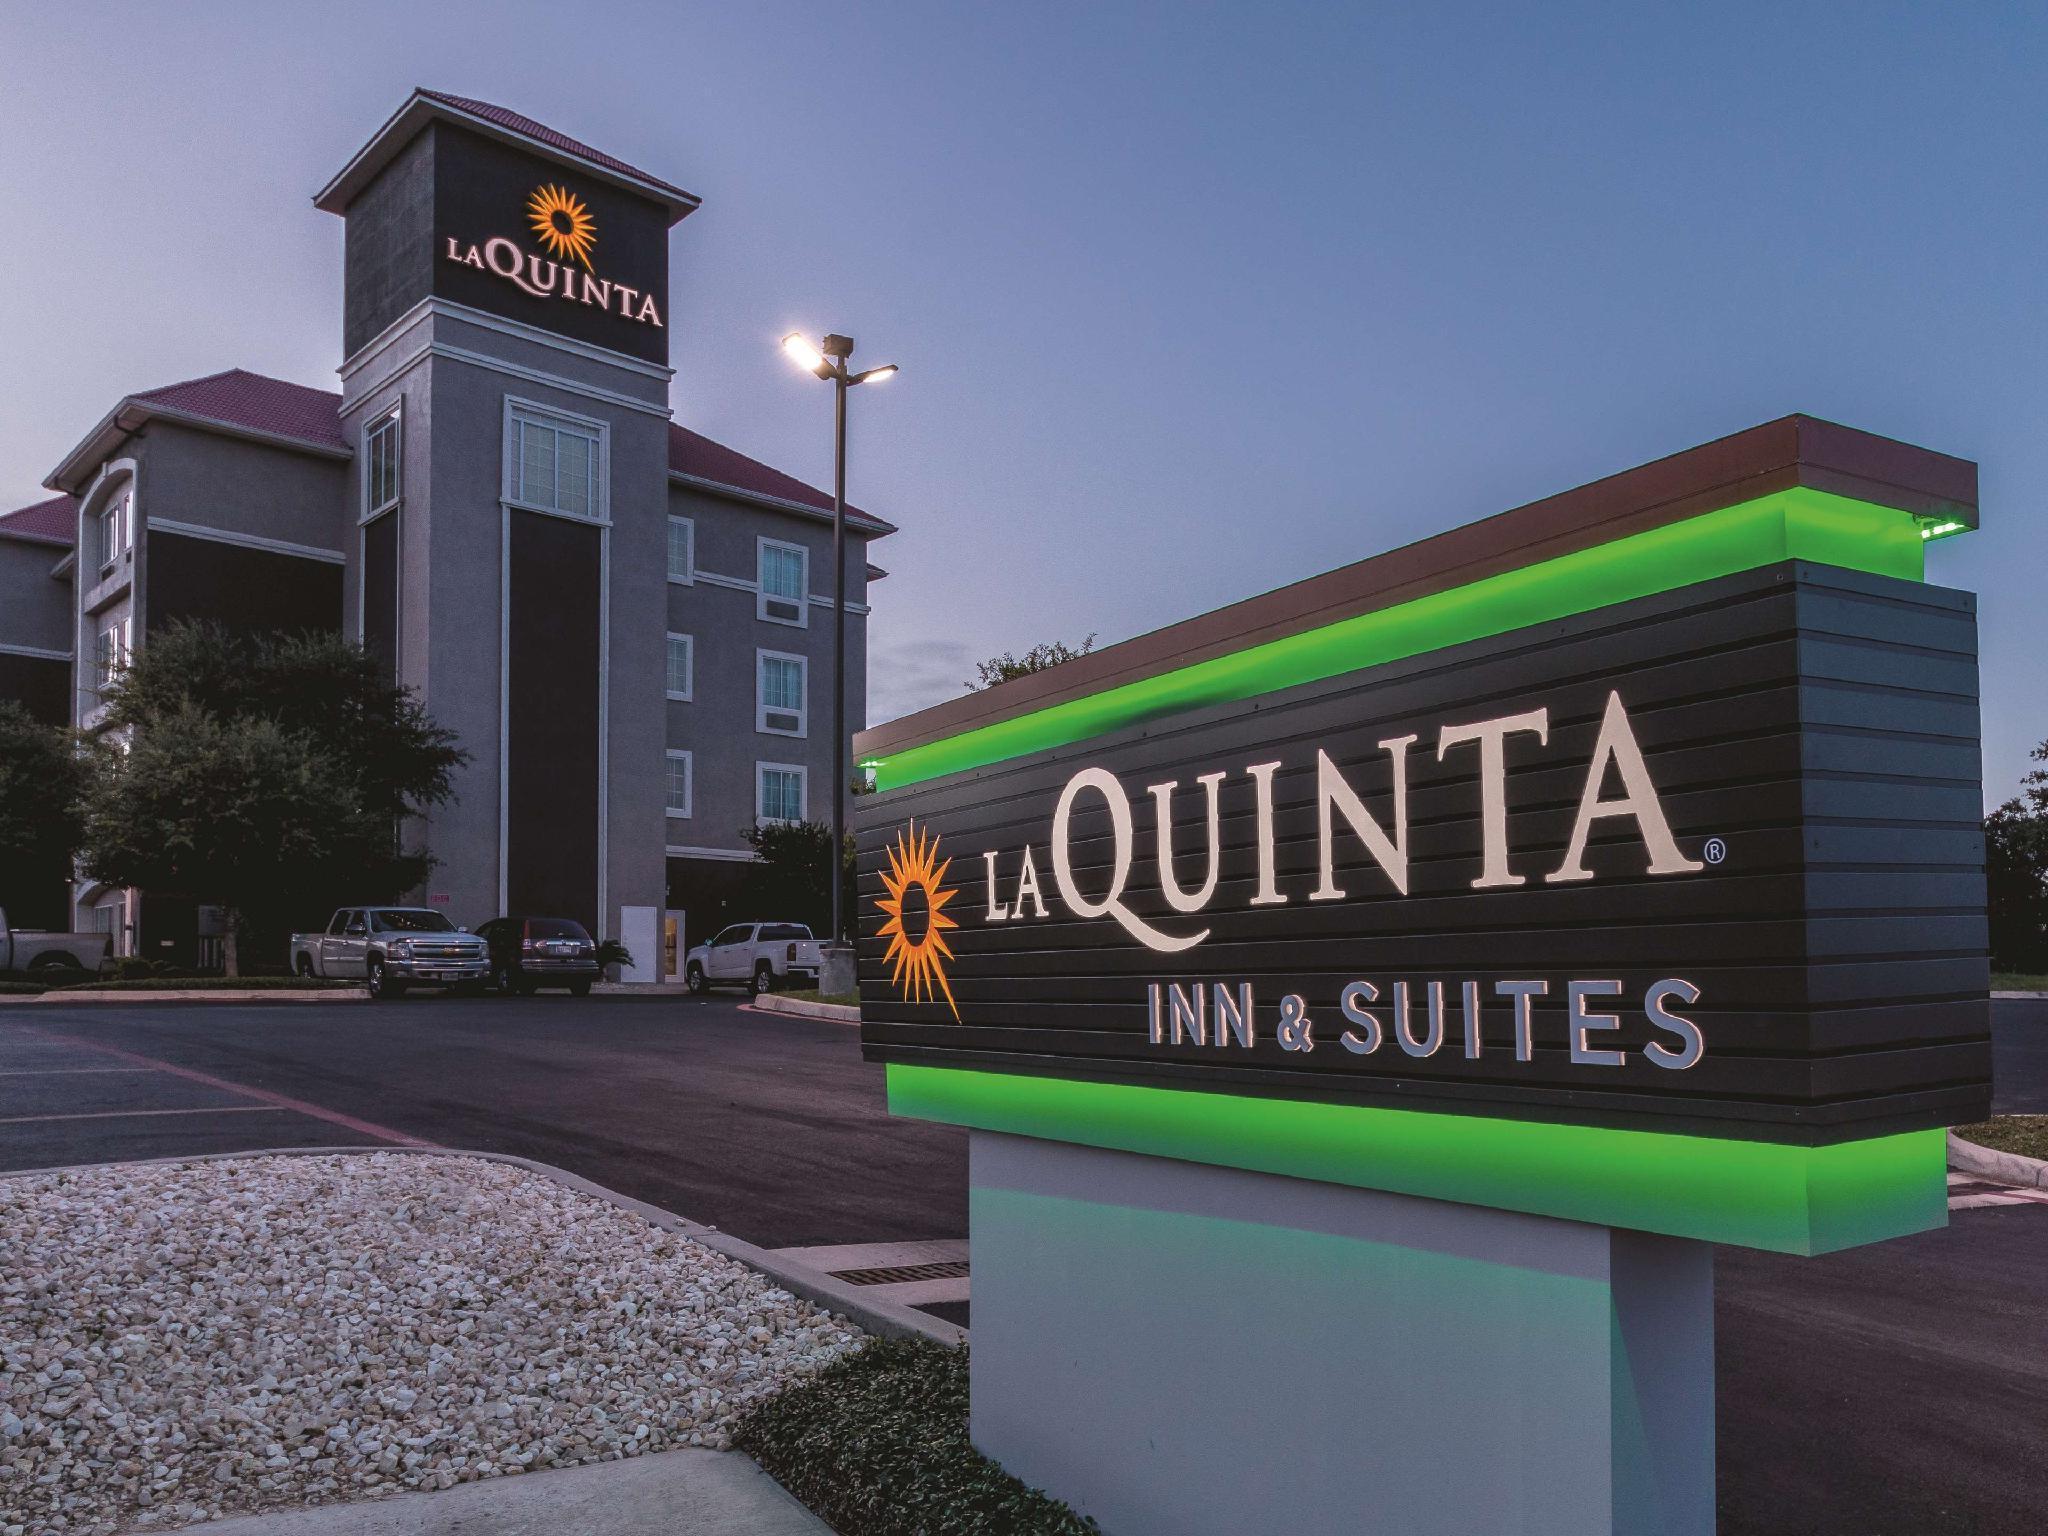 La Quinta Inn And Suites By Wyndham San Antonio Northwest